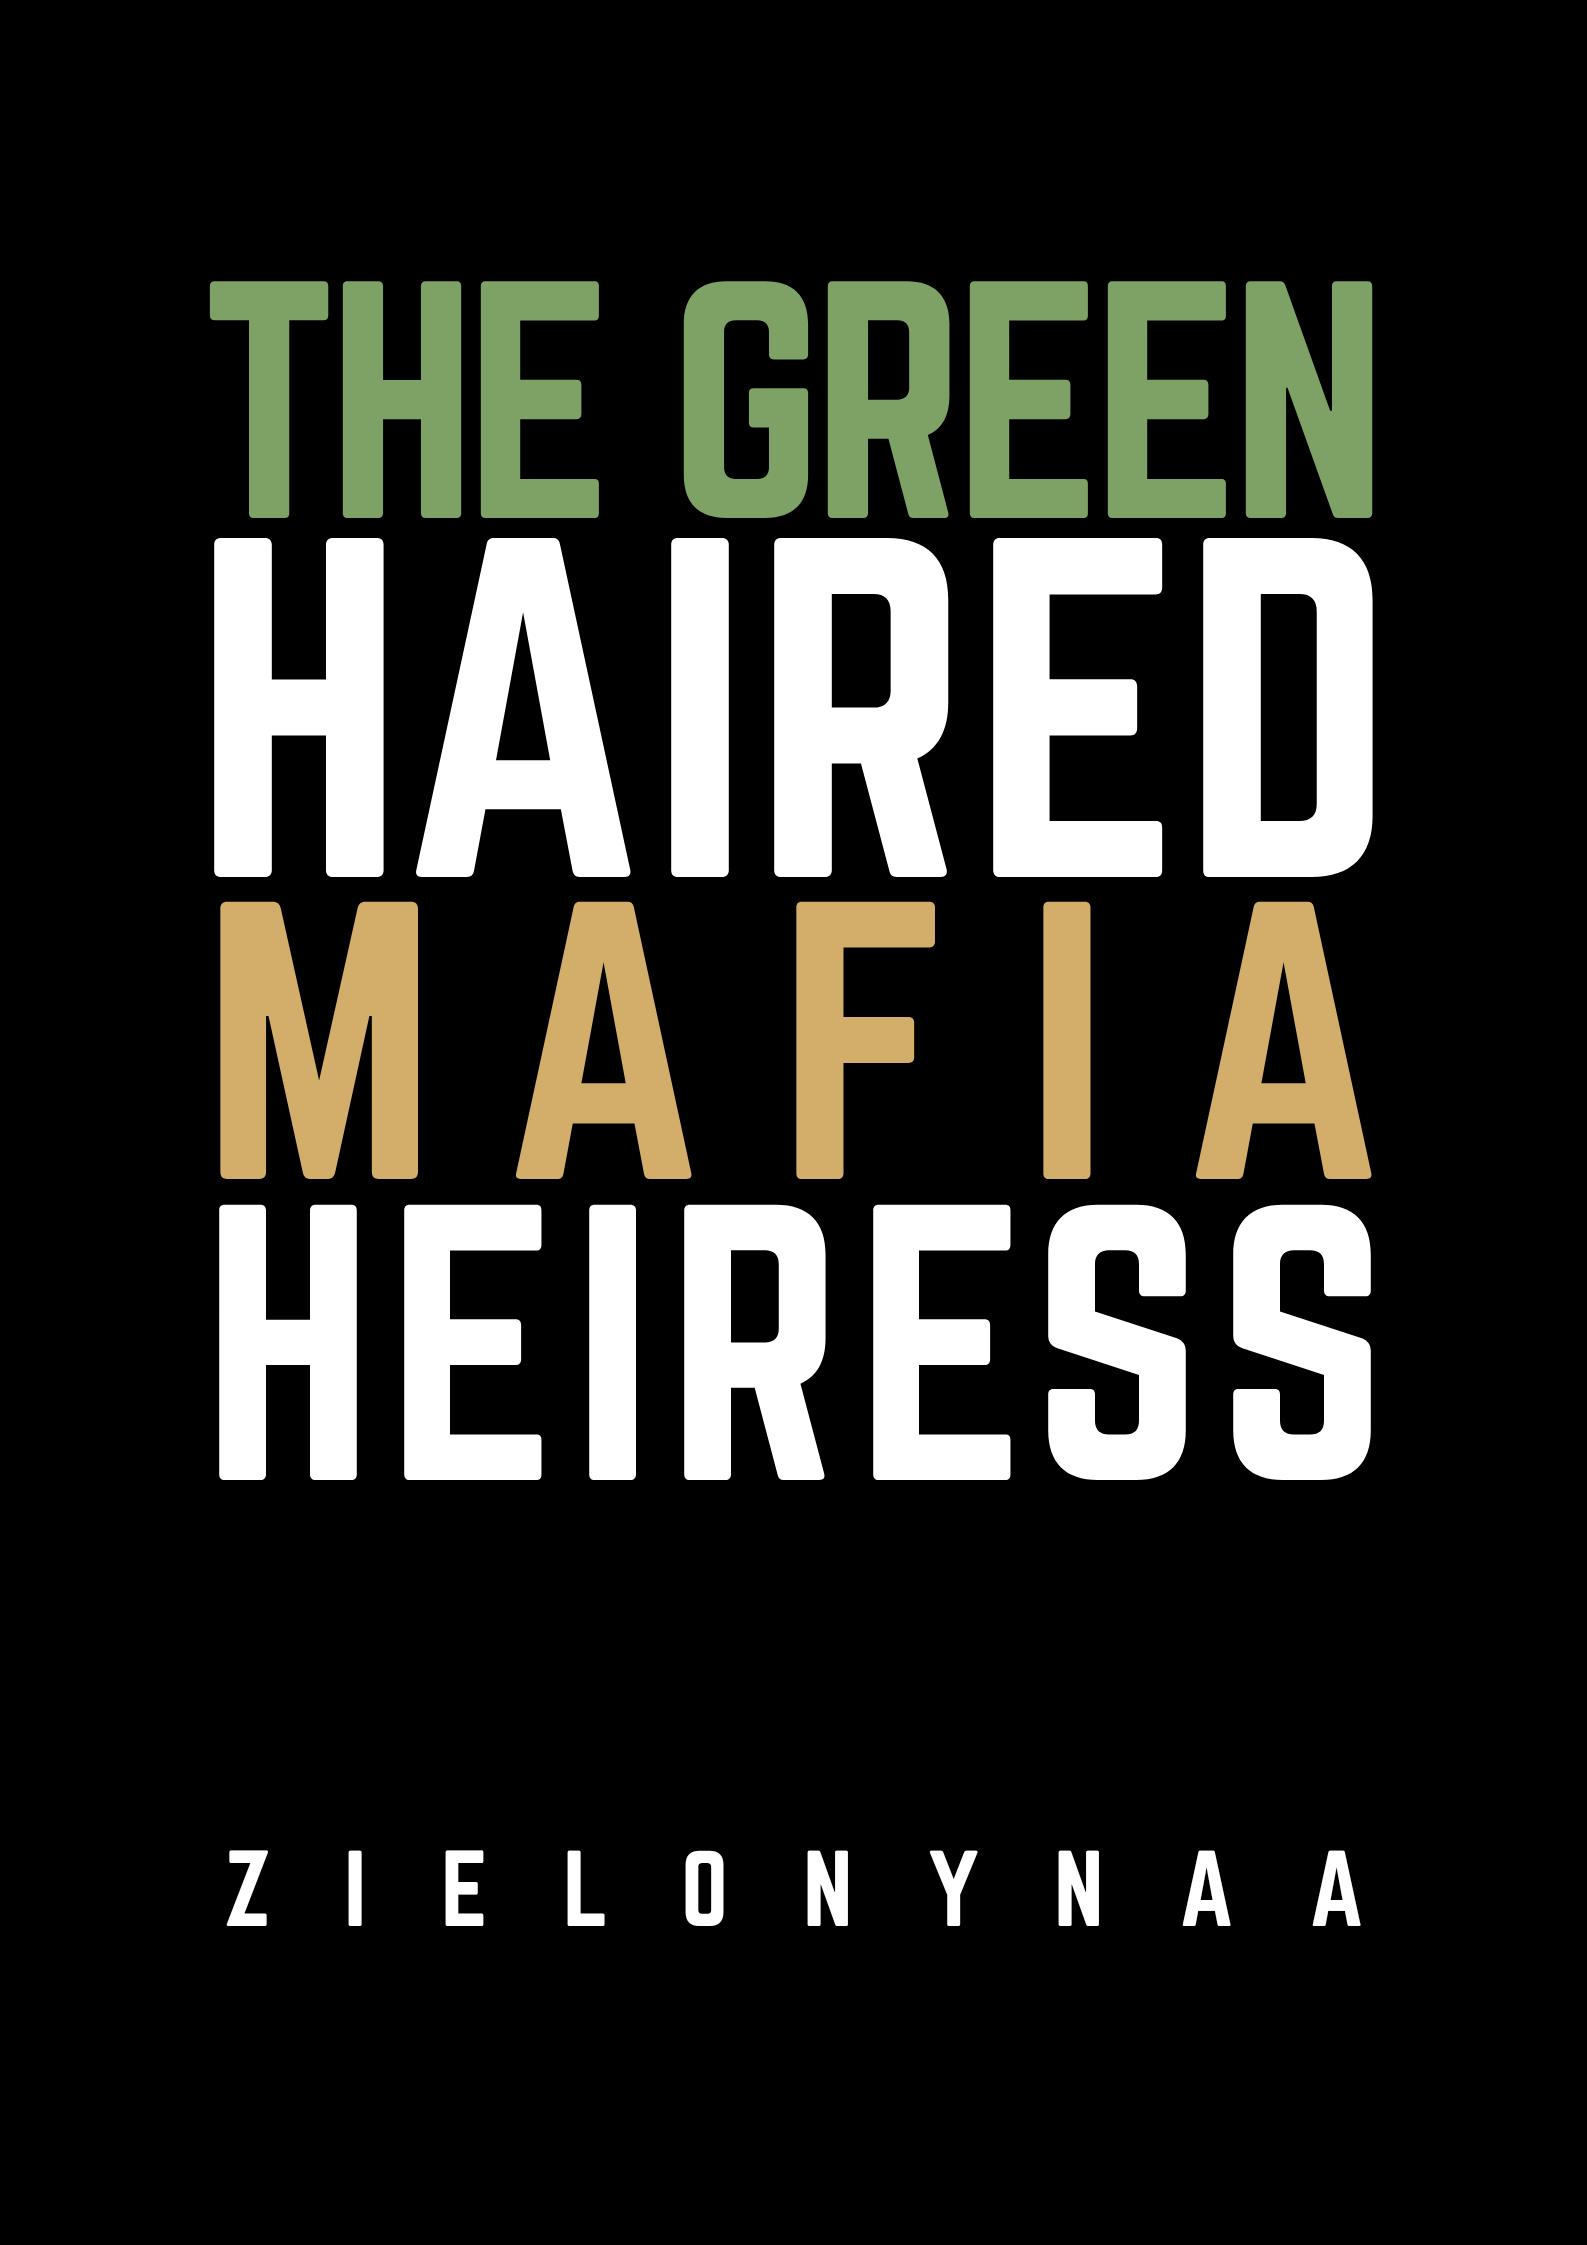 The Green Haired Mafia Heiress